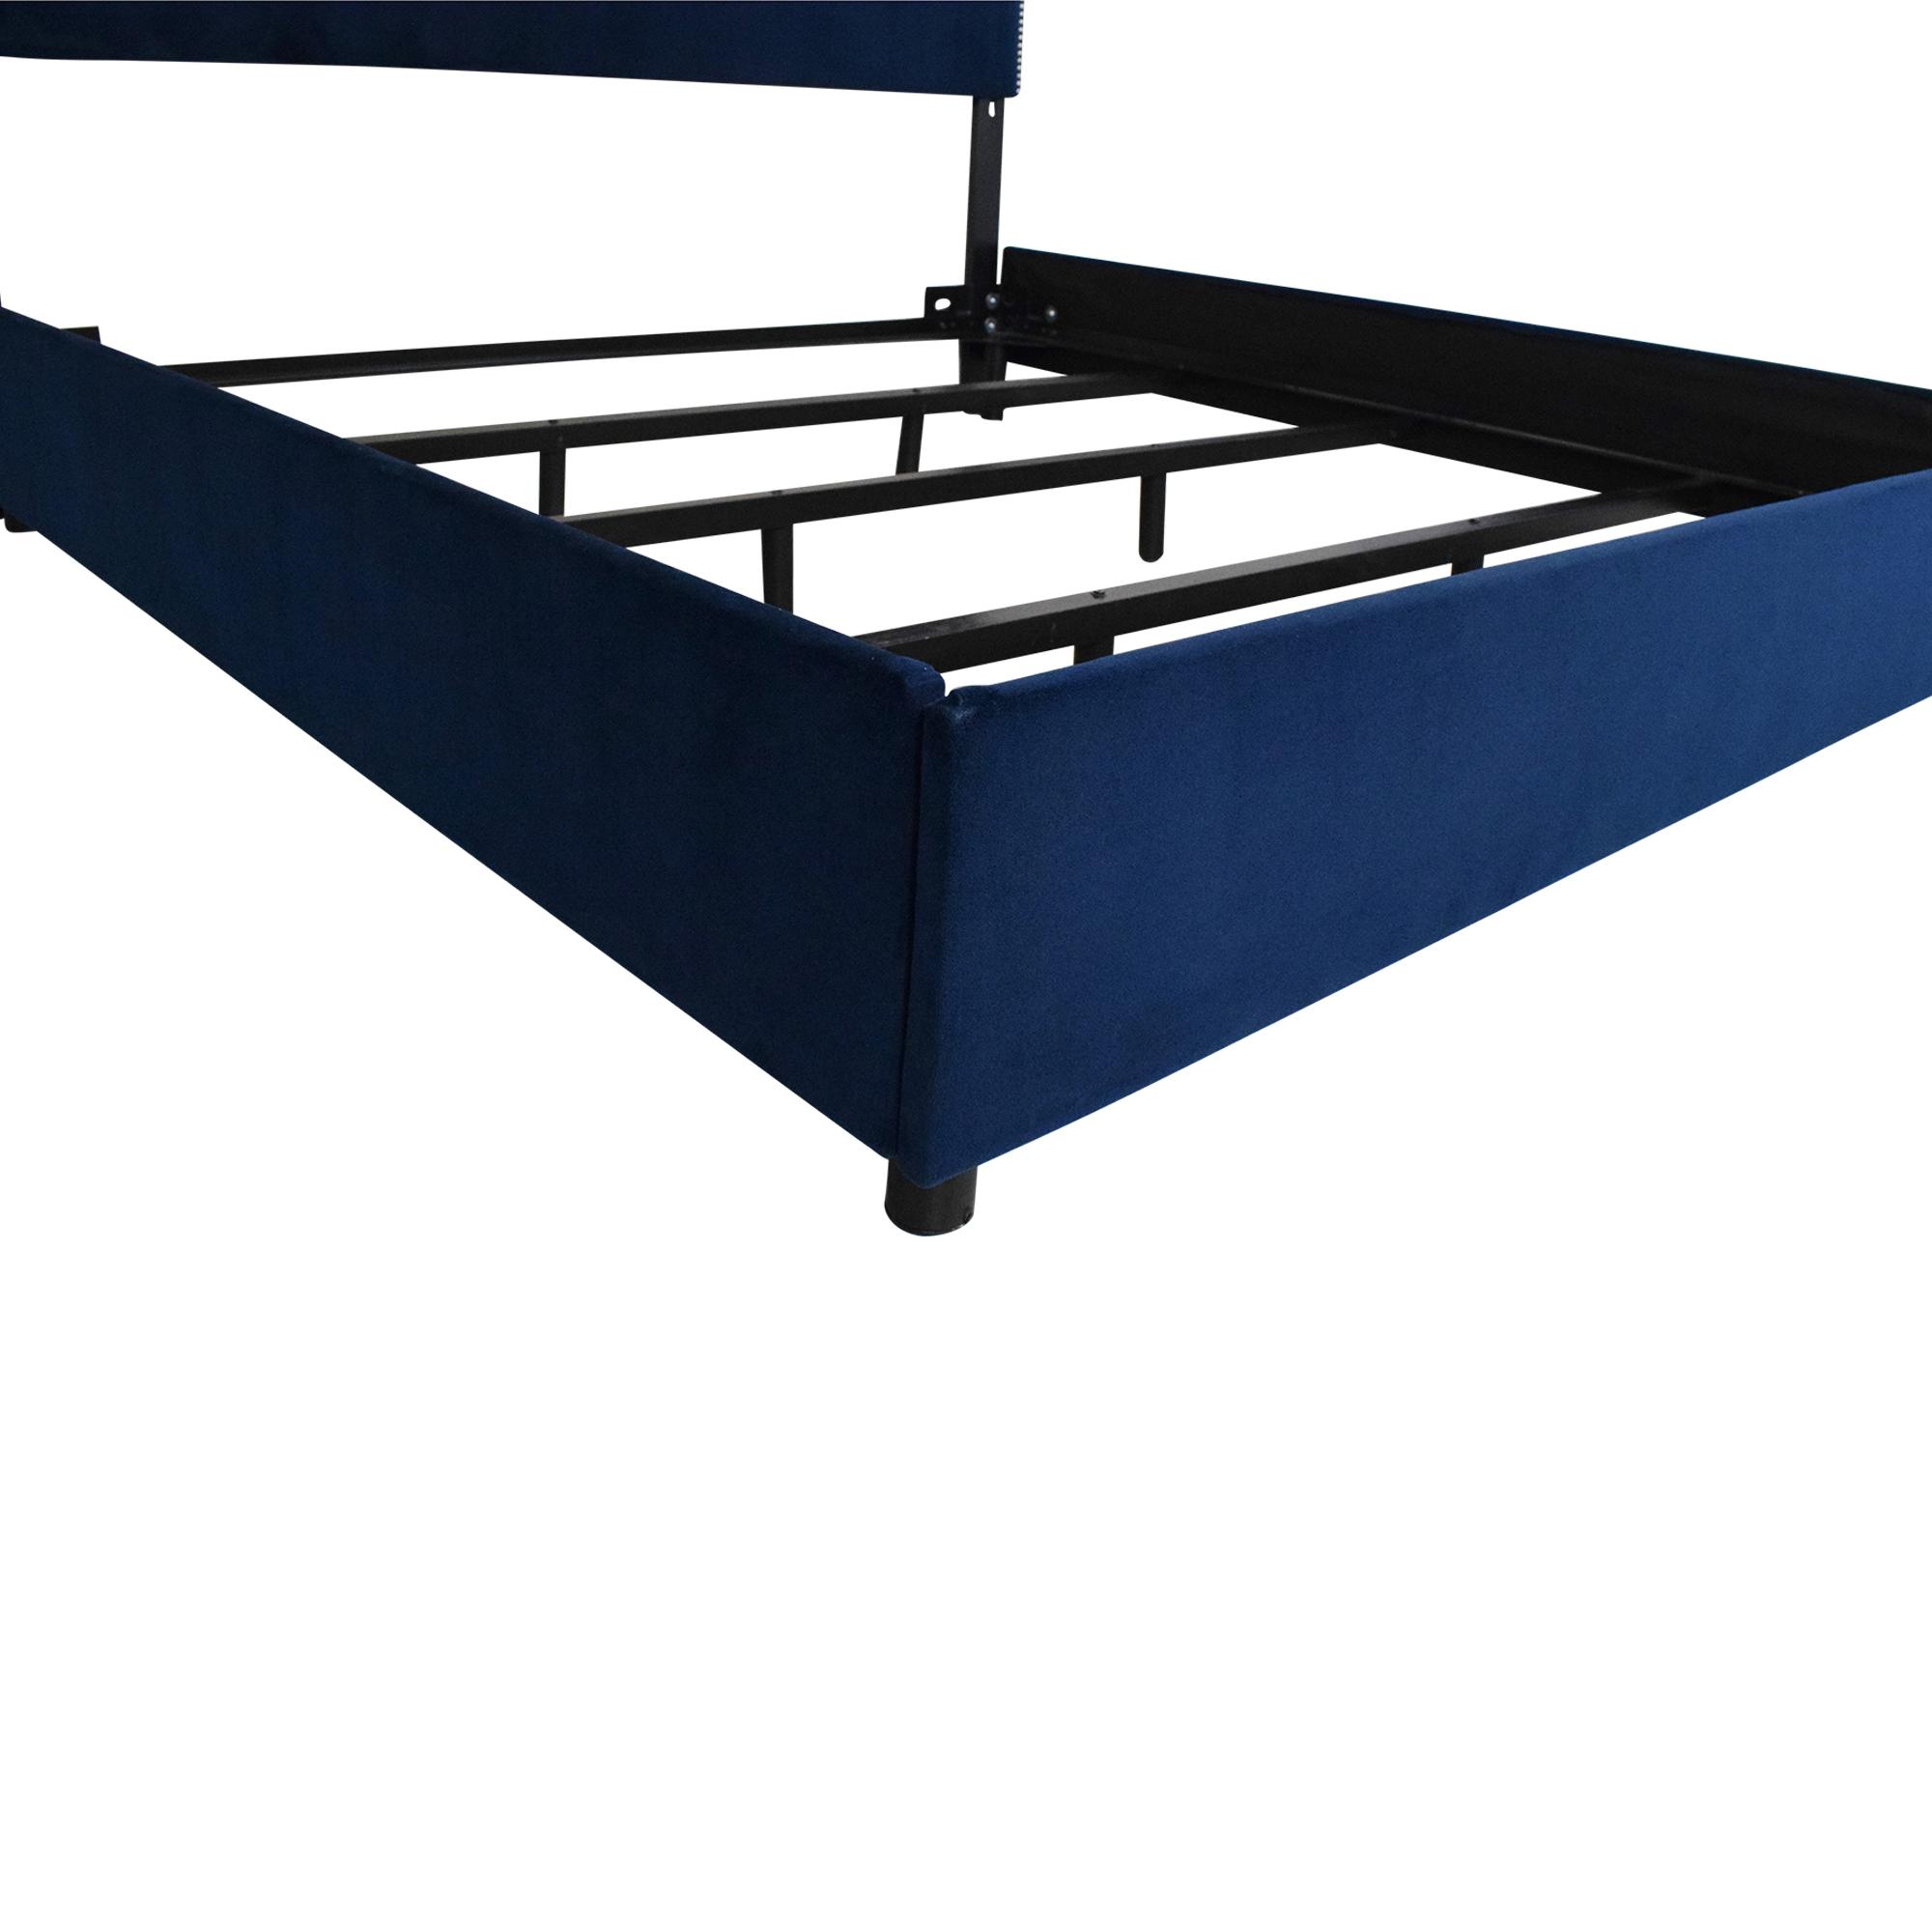 Skyline Furniture Skyline Nailhead King Bed with Headboard ct